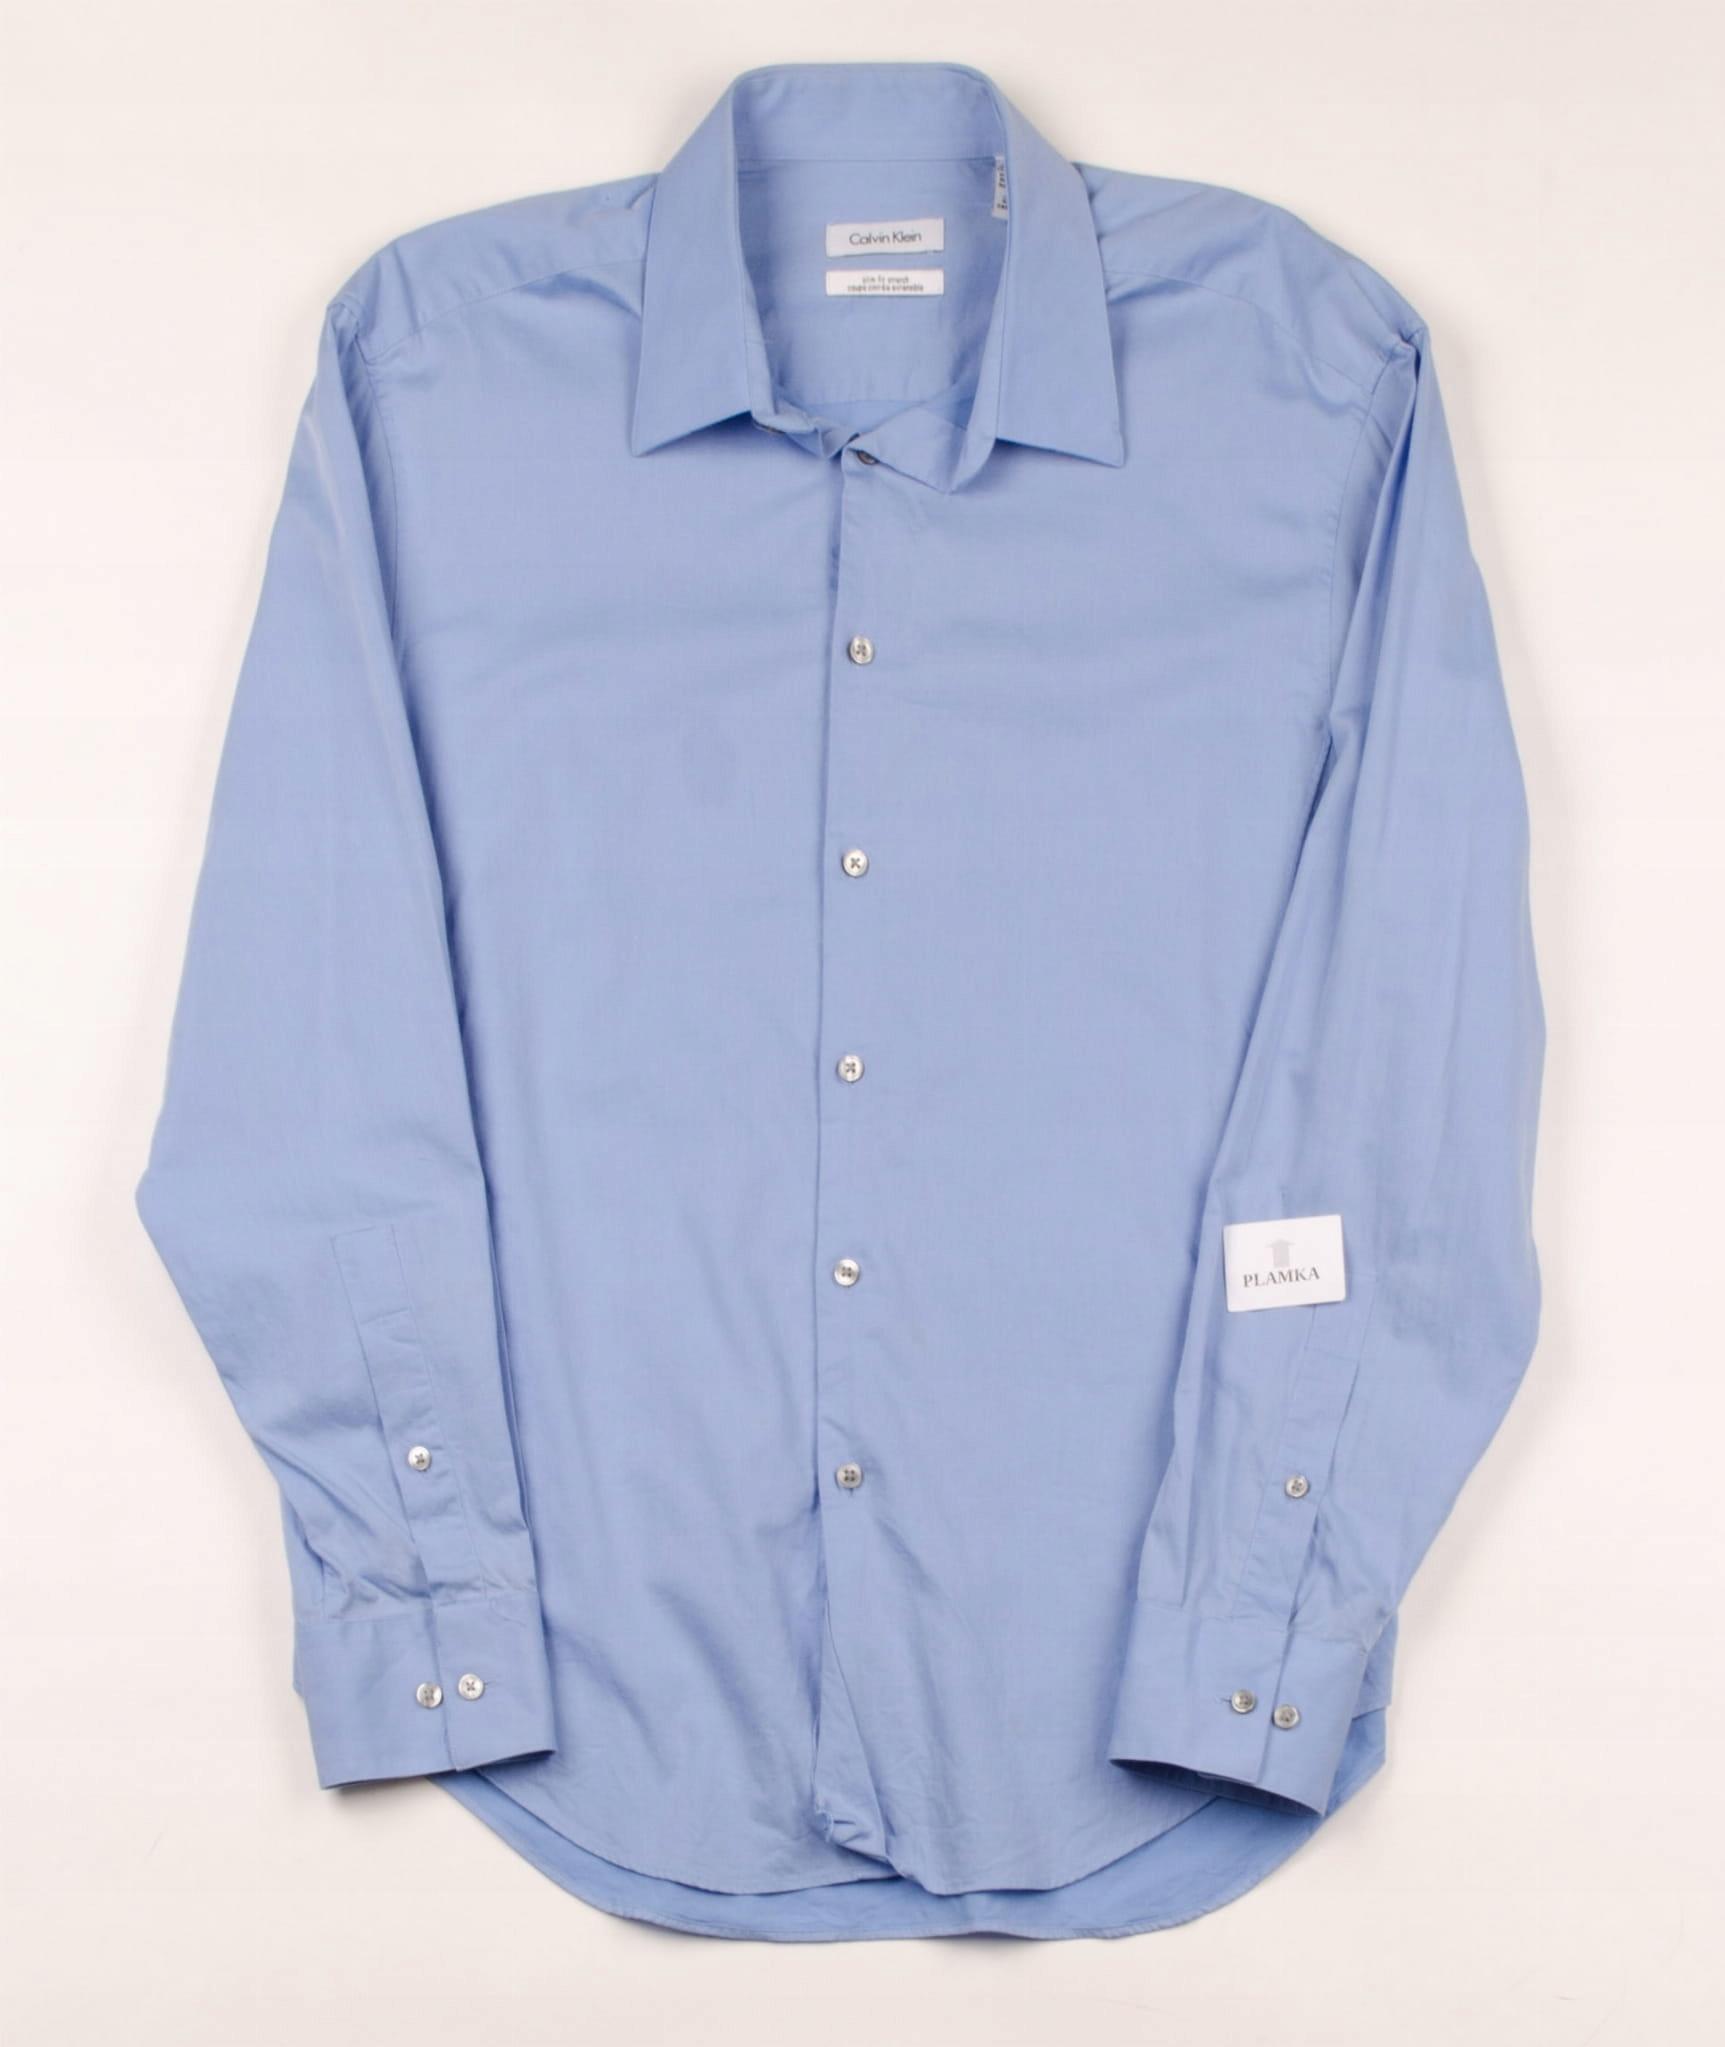 36888 Pranie Calvin Klein Koszula Męska M